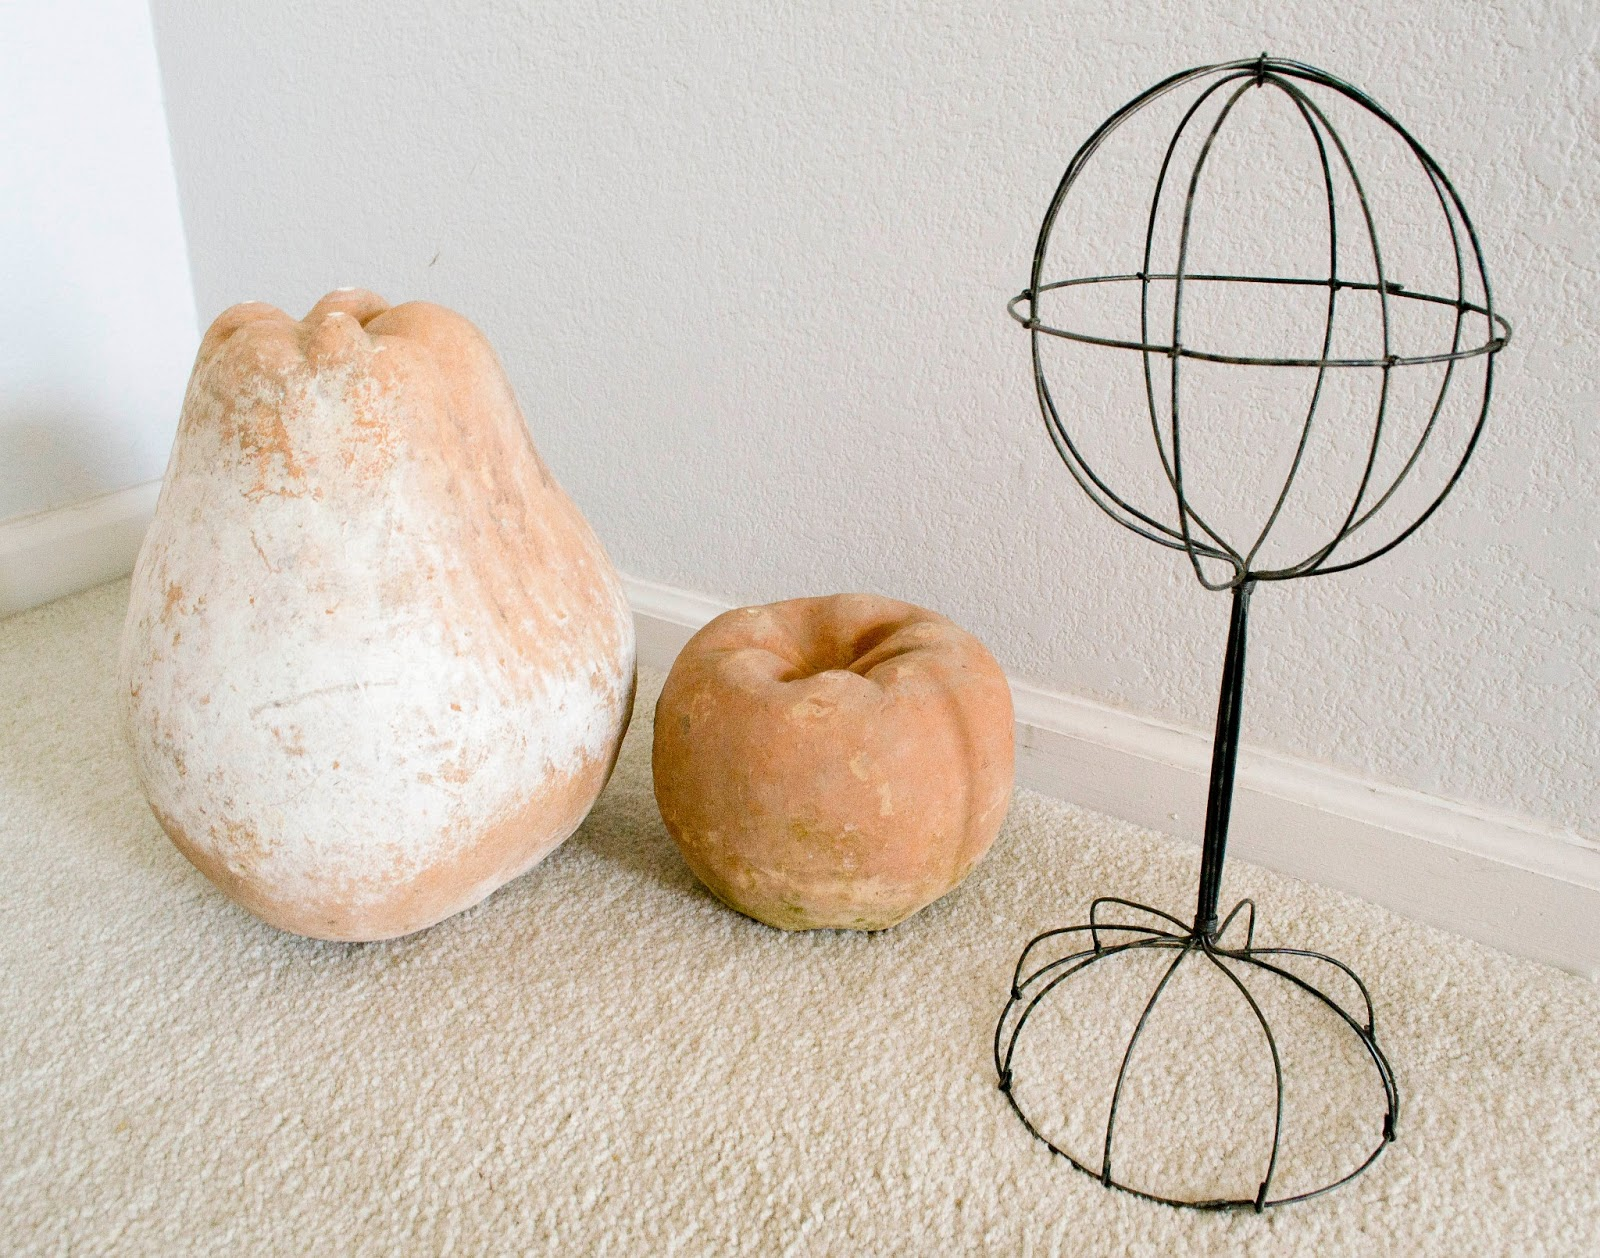 heidi schatze: Shopping - Where I've Been Dropping Dough